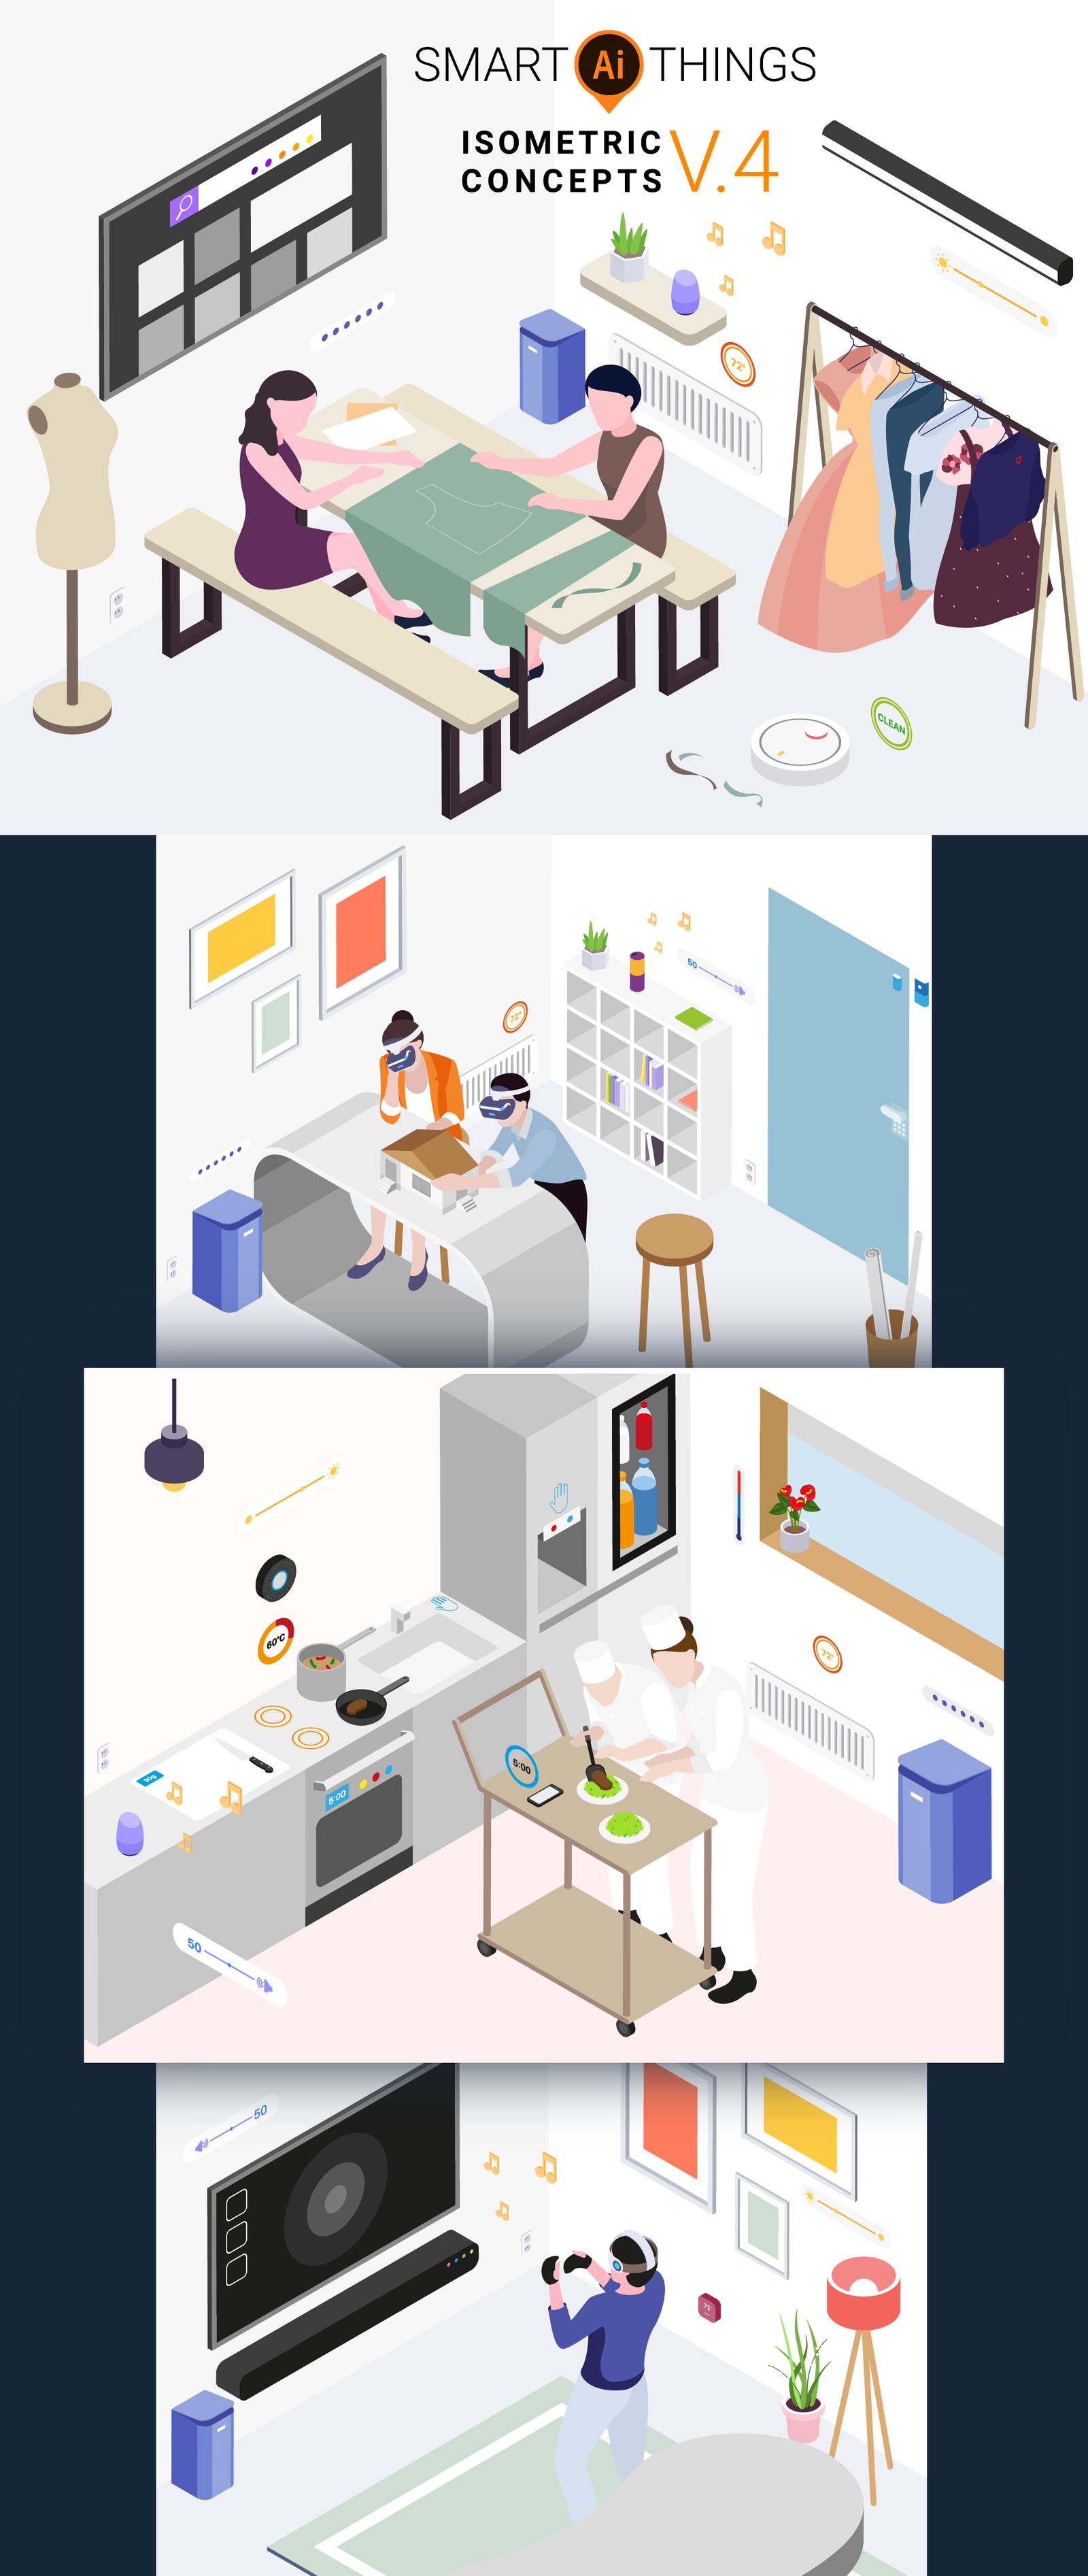 Smart Things Isometric Illustration Concept v.4